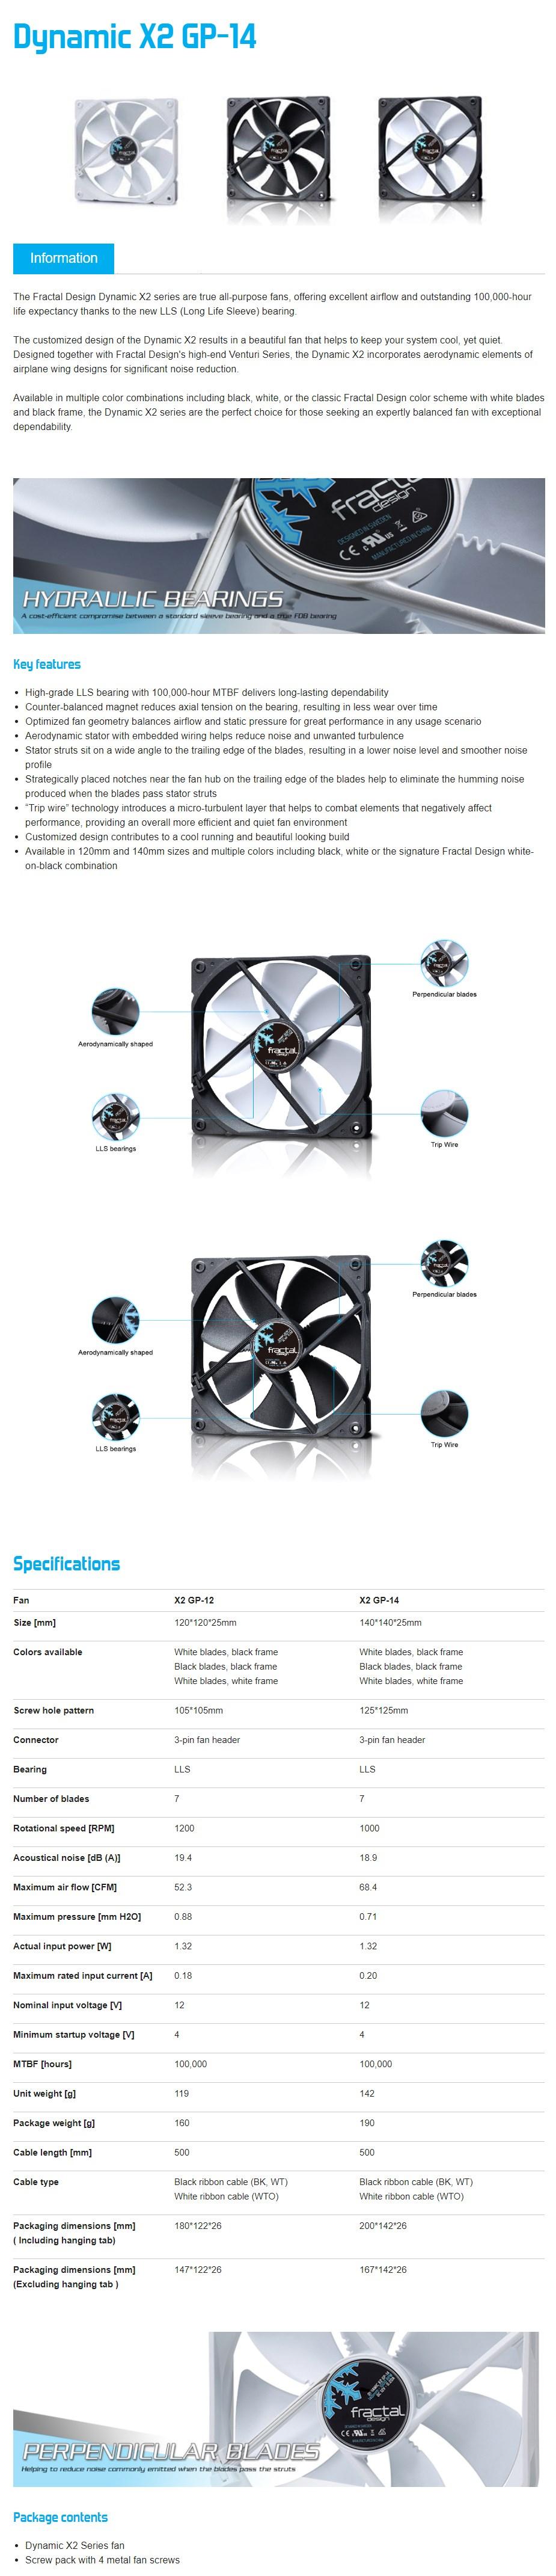 Fractal Design Dynamic Series X2 GP-14 140mm Case Fan - White - Desktop Overview 1